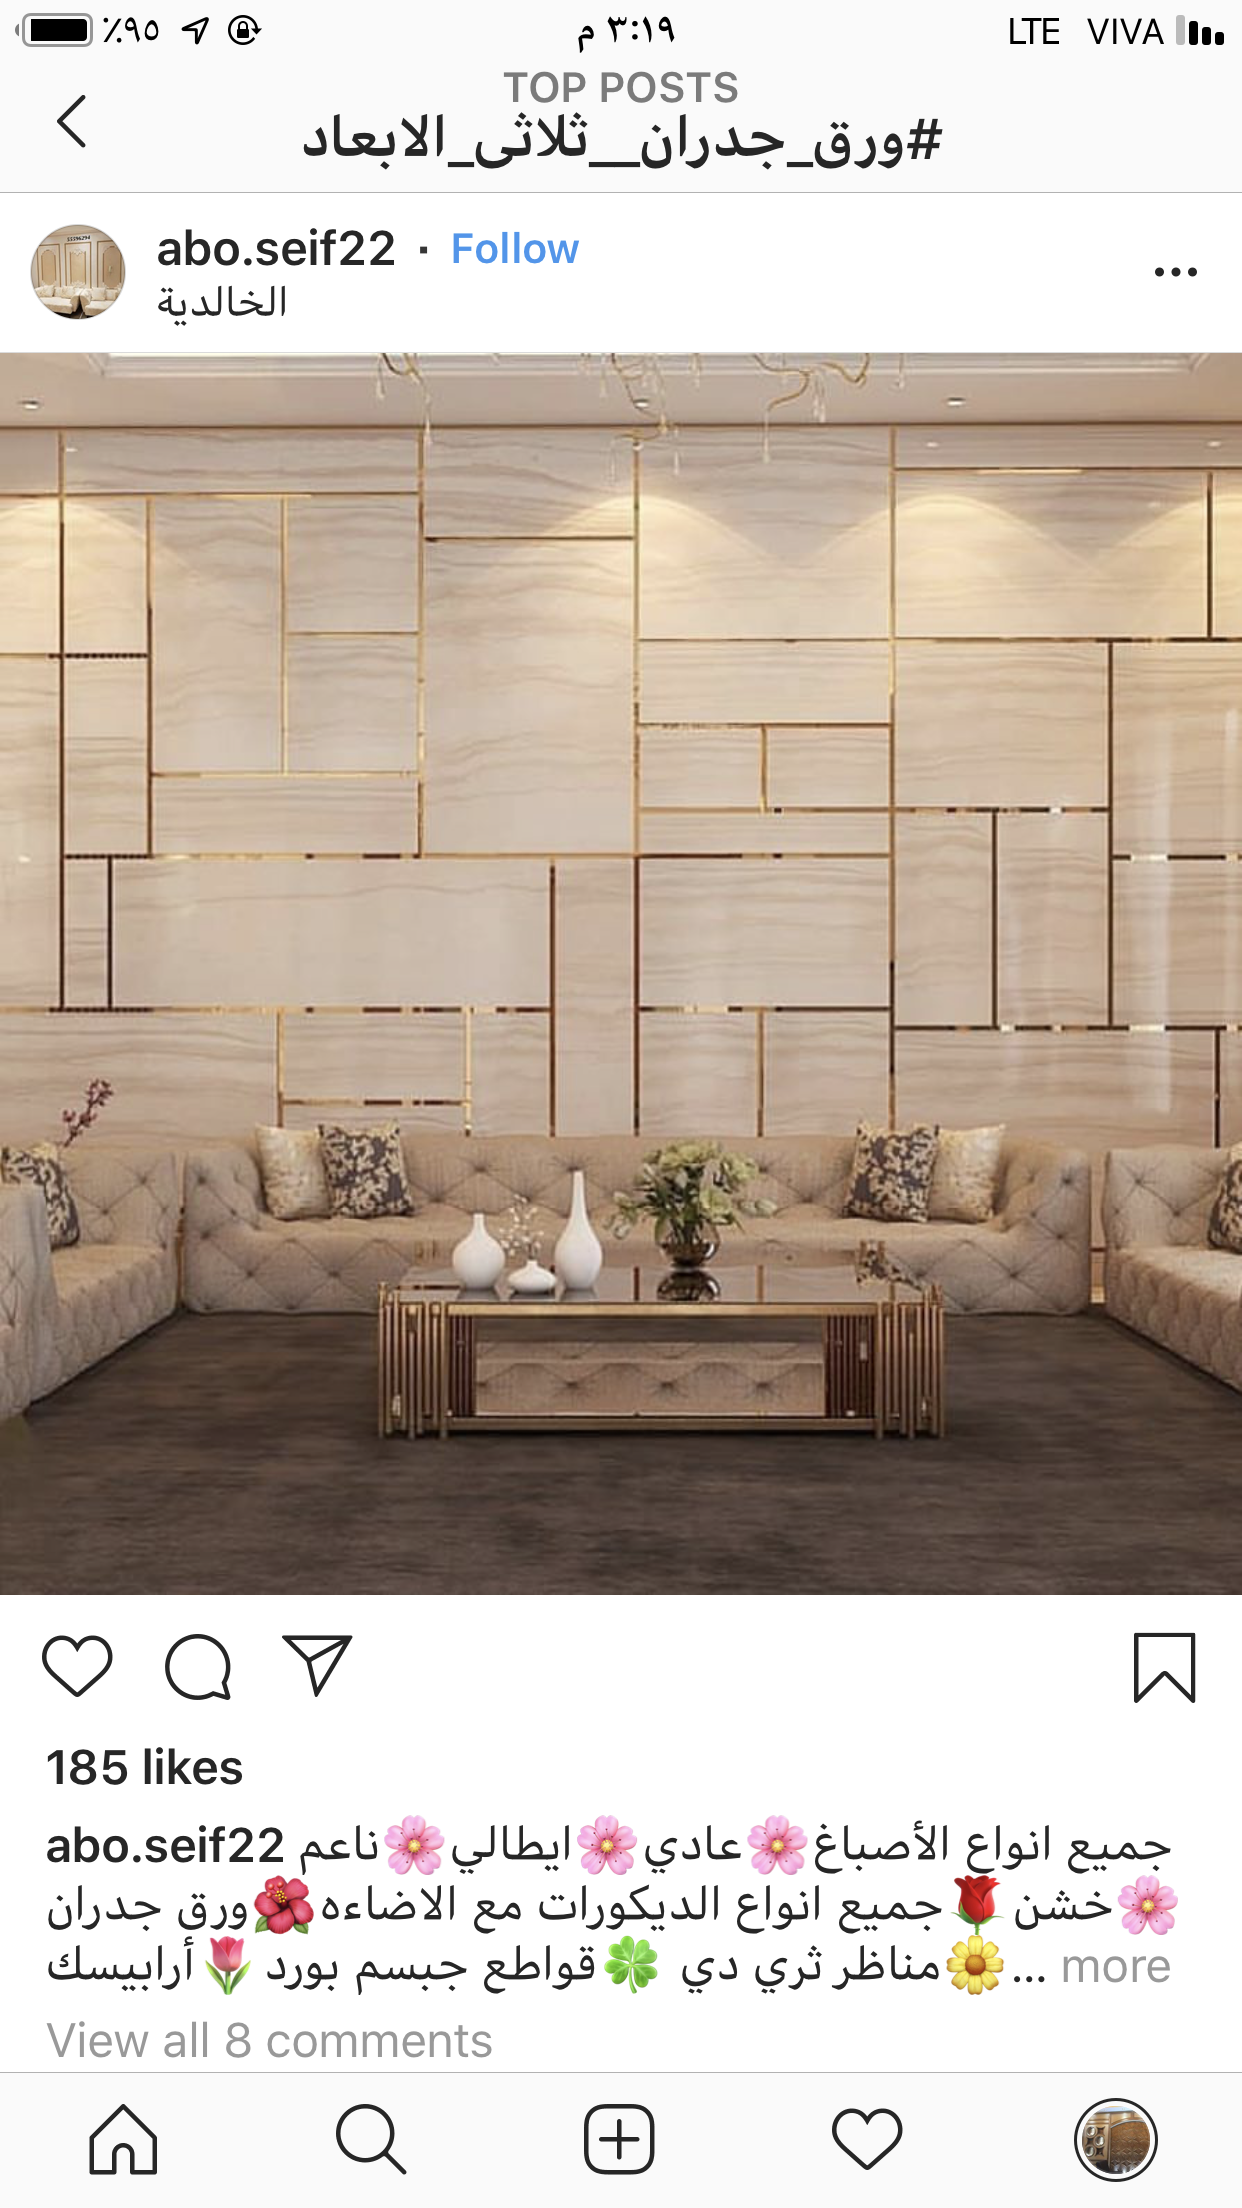 اصباغ وديكورات كل ماهو جديد في عالم الاصباغ ساده ايطالي صبغ لكر ناري ورق جدران بديل الر Luxury Dining Room Tables Home Design Floor Plans Home Room Design